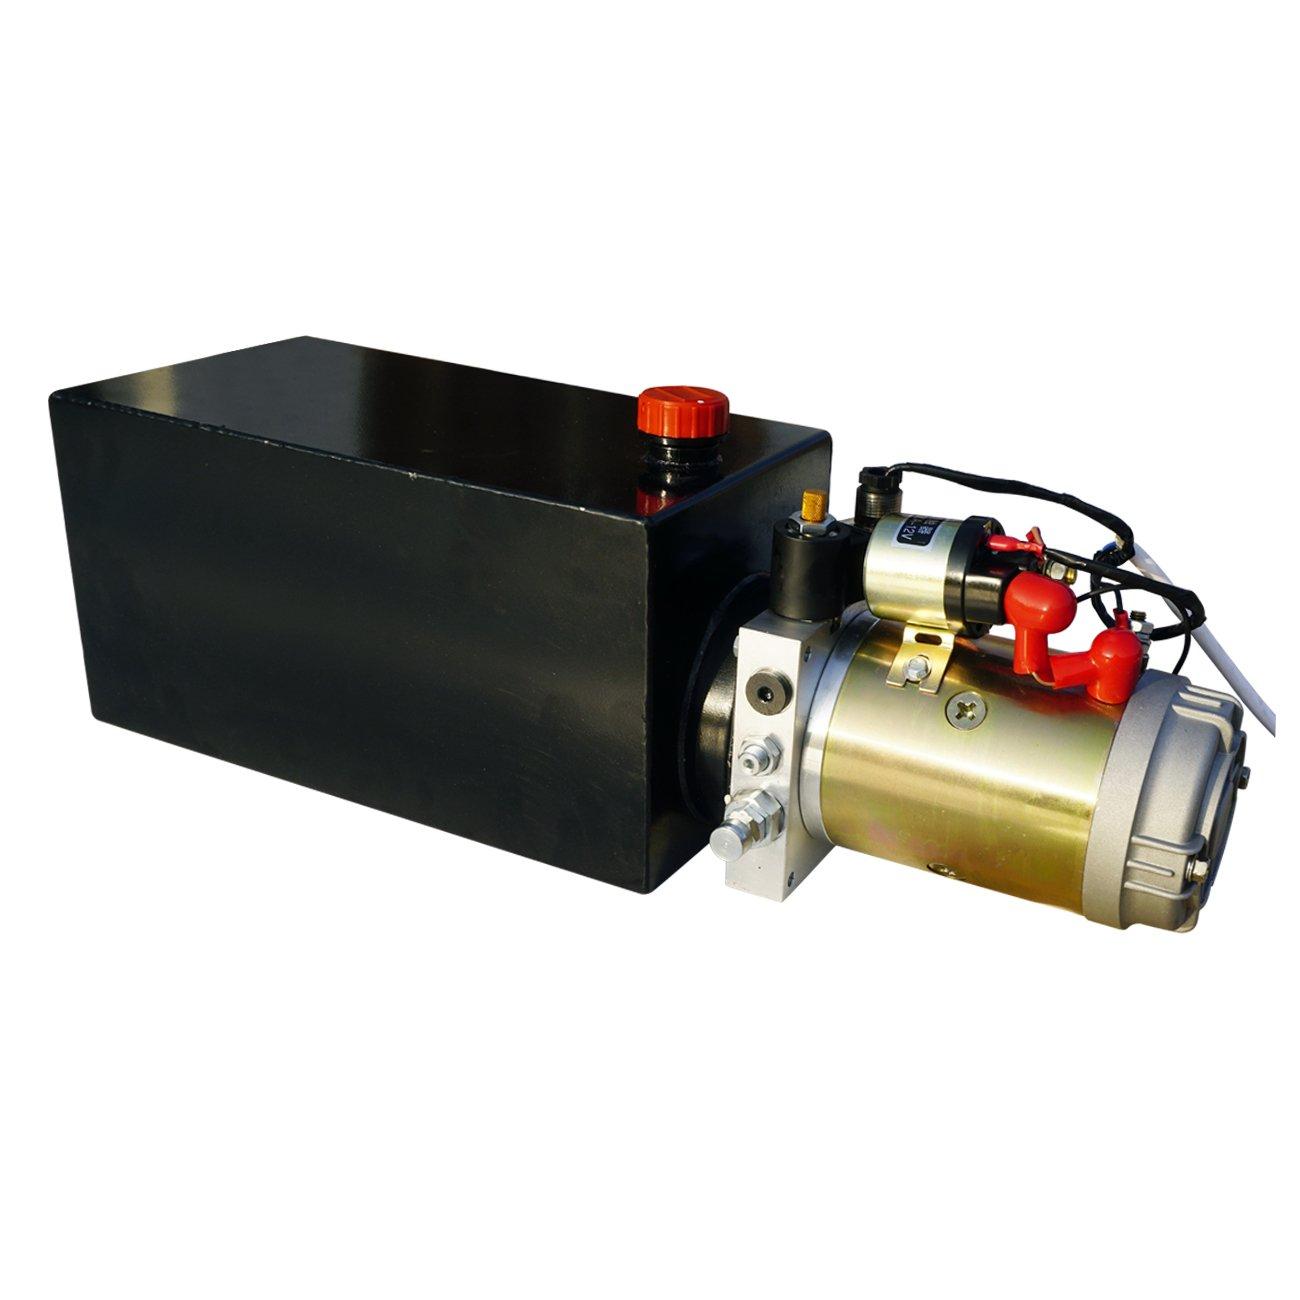 ECO-worthy 10クオート タンク 油圧動力ポンプ 単作用コントロールリフトユニット B01N5AHAVC